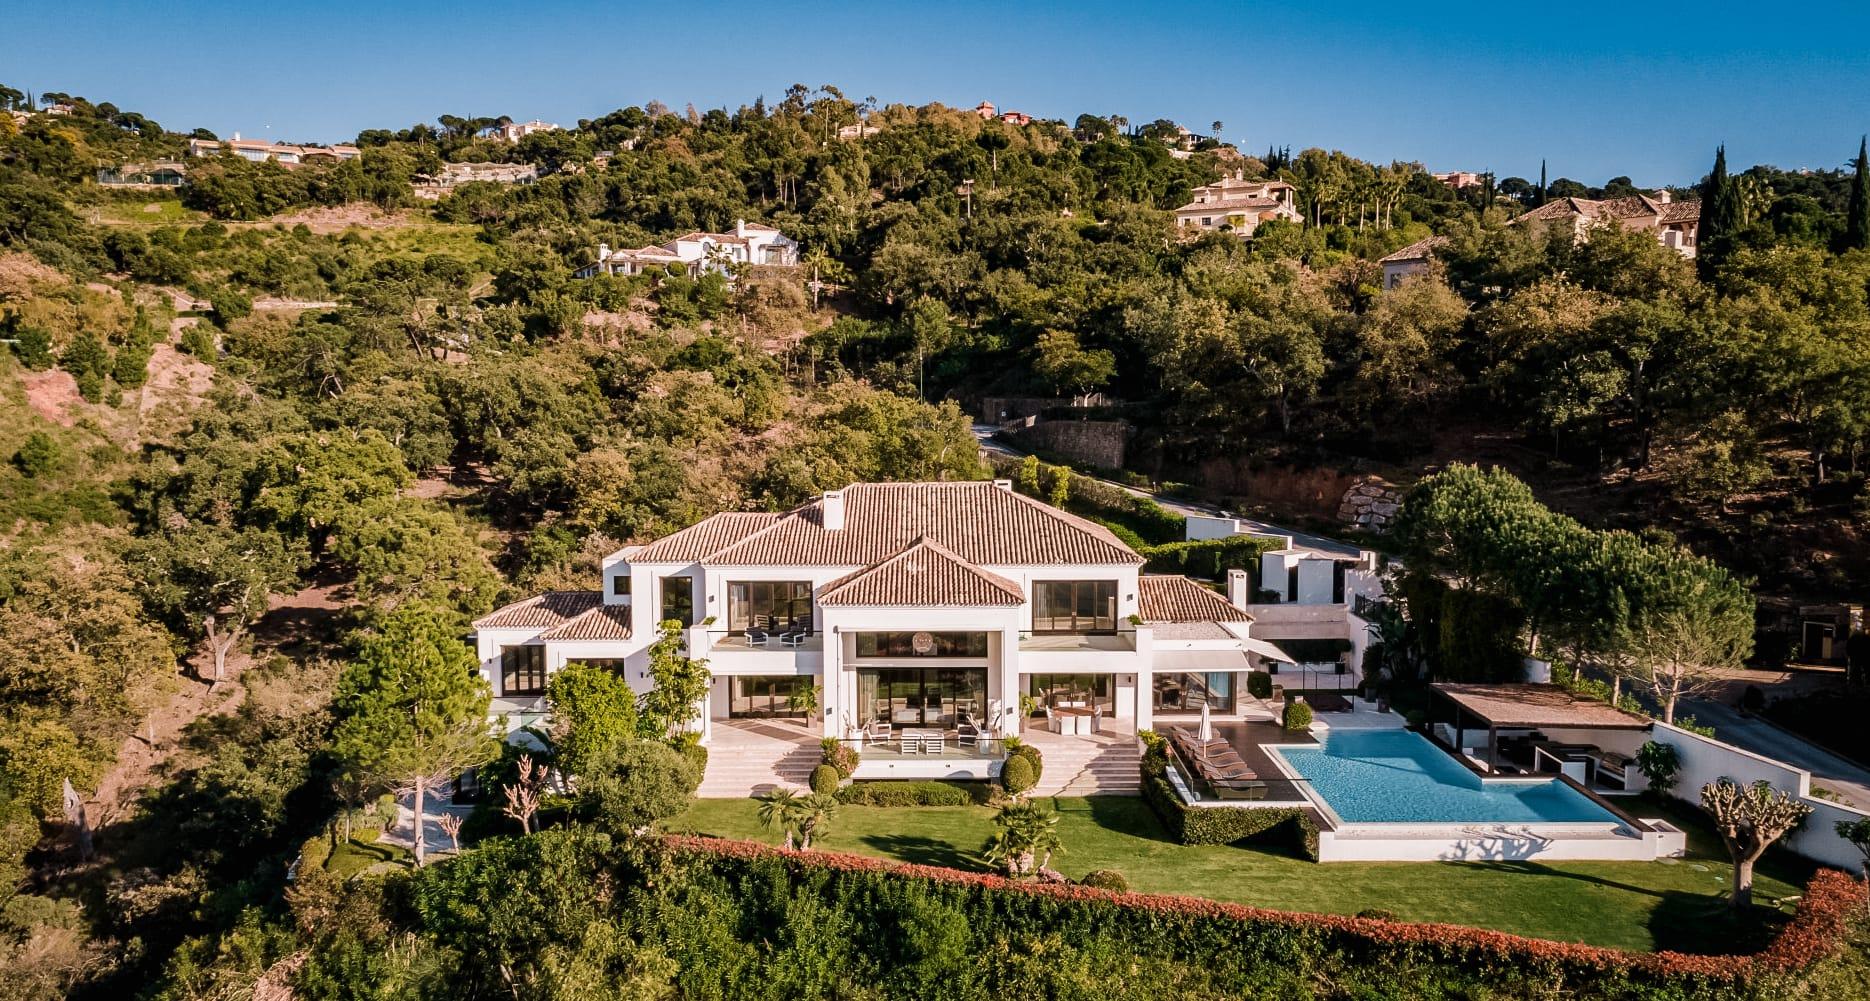 Villa in Zagaleta, Marbella